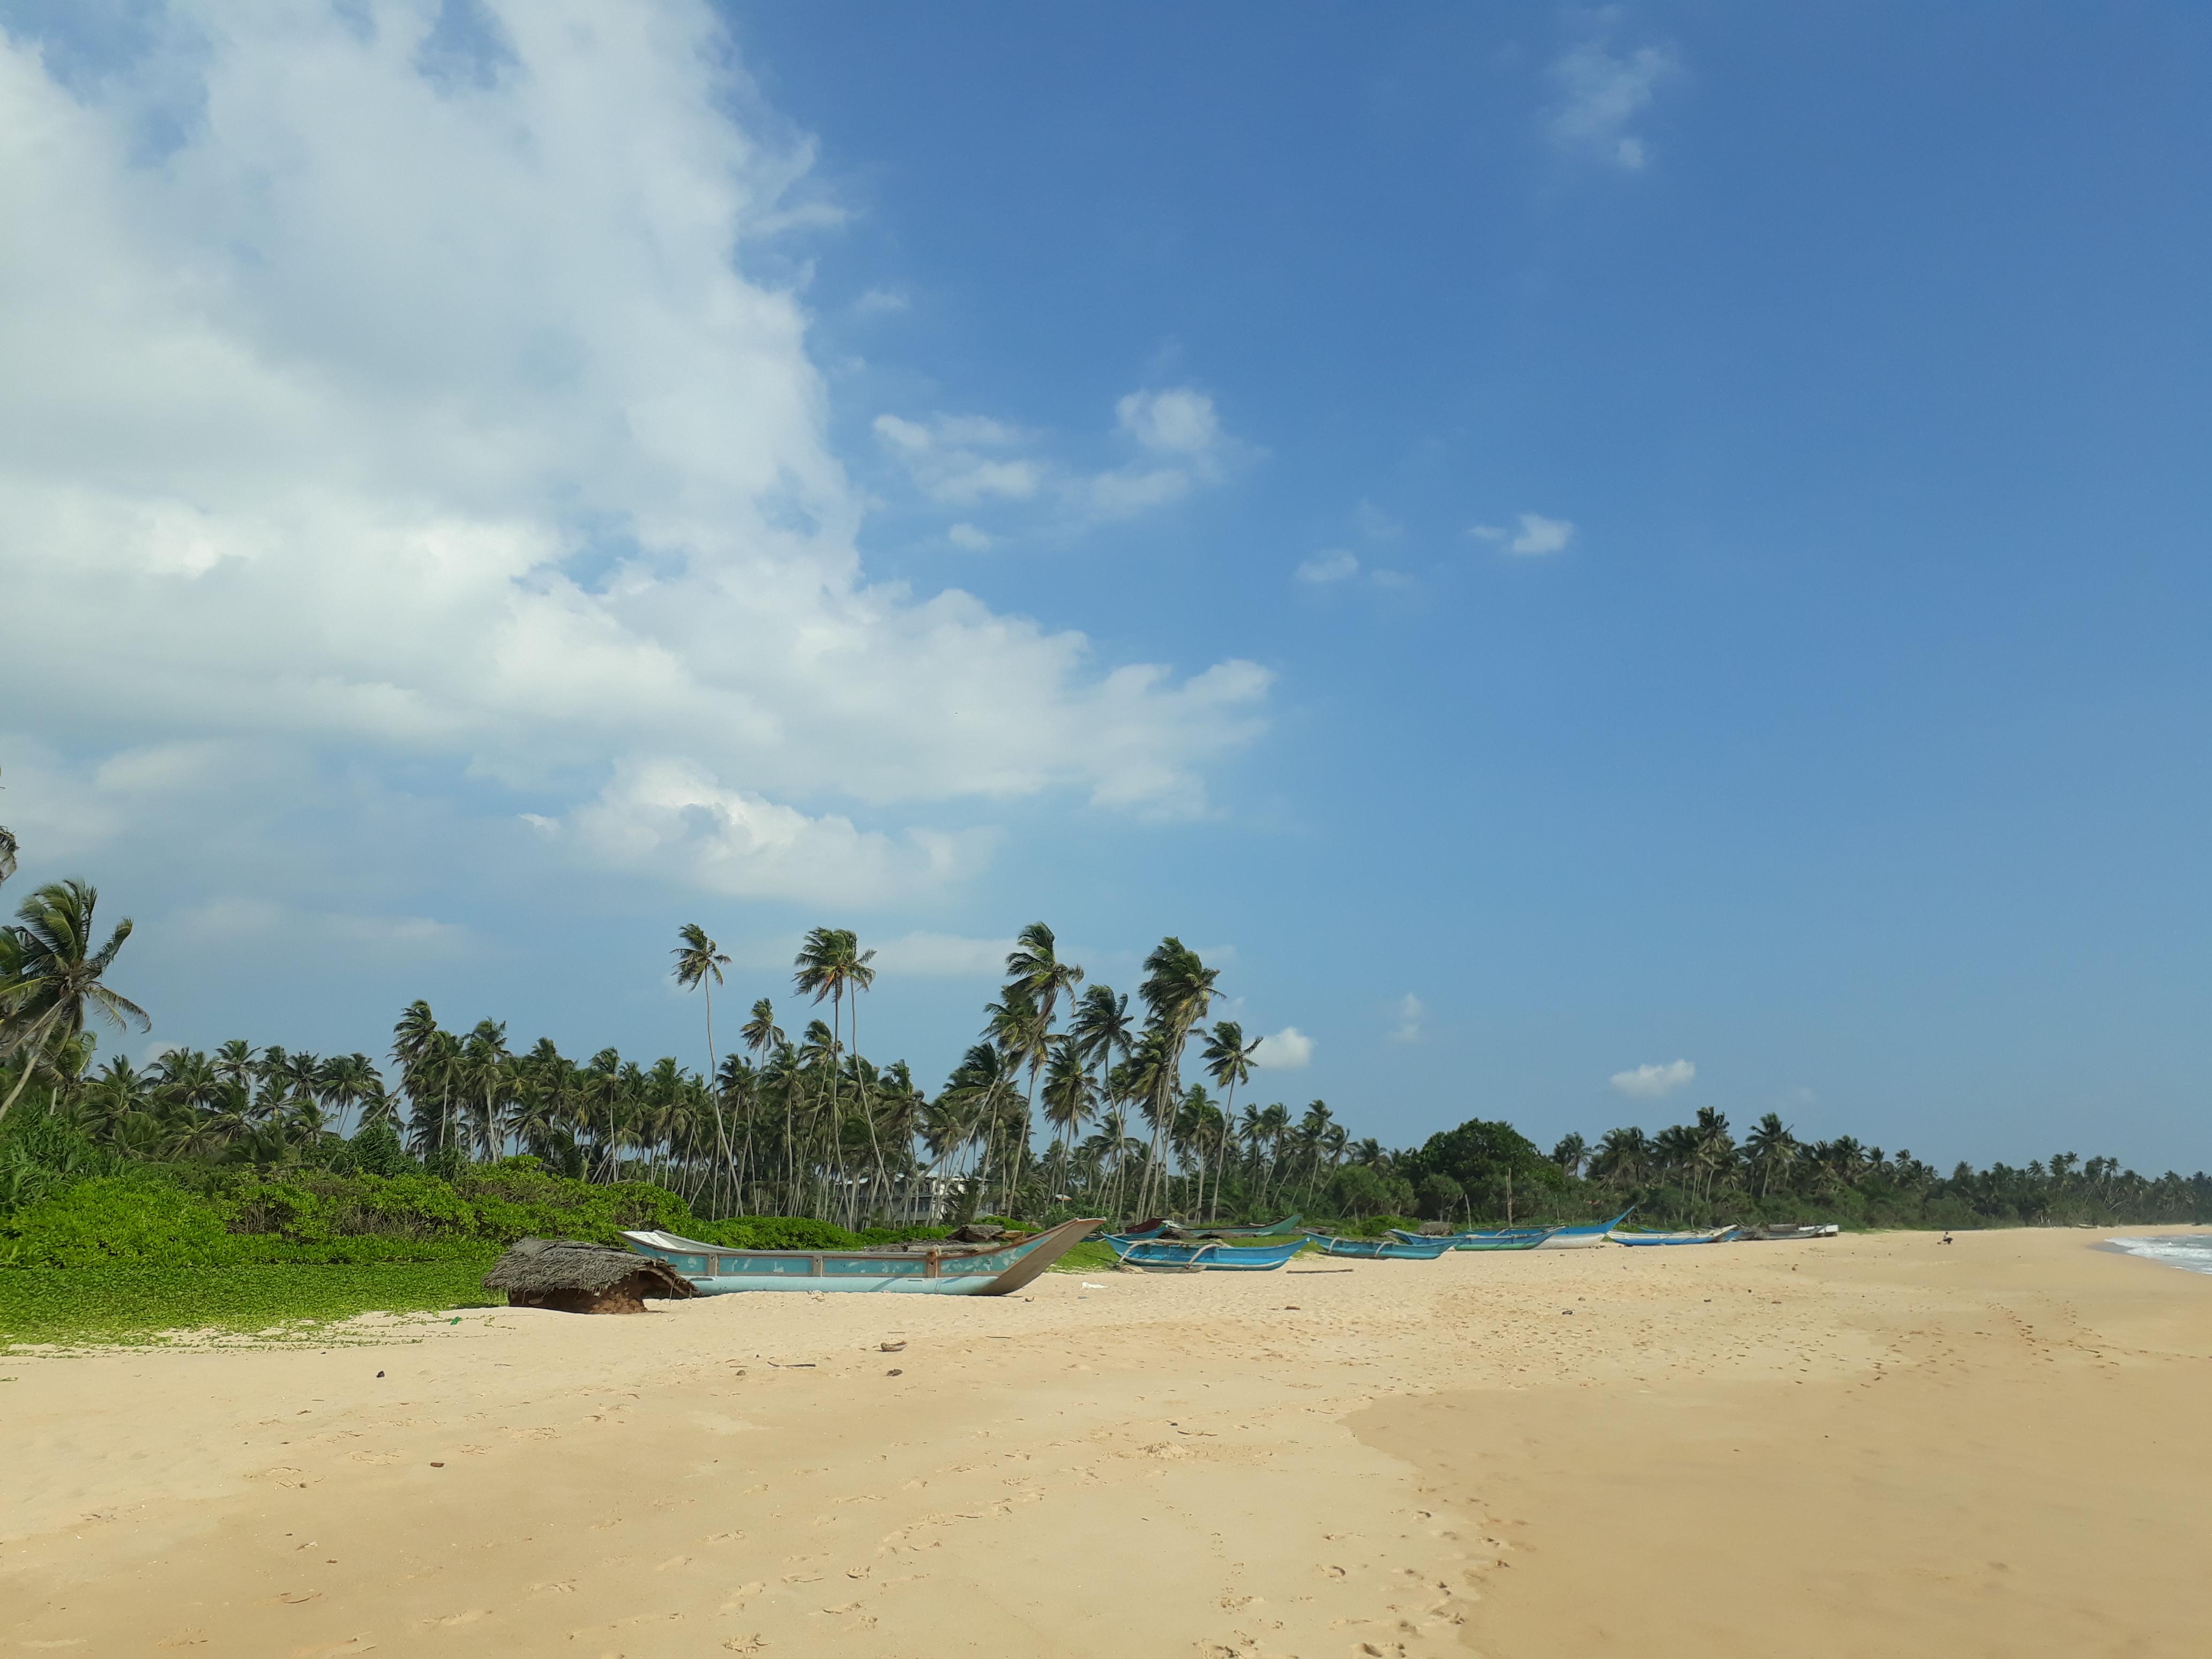 Srilanka - Ahungalla 2017